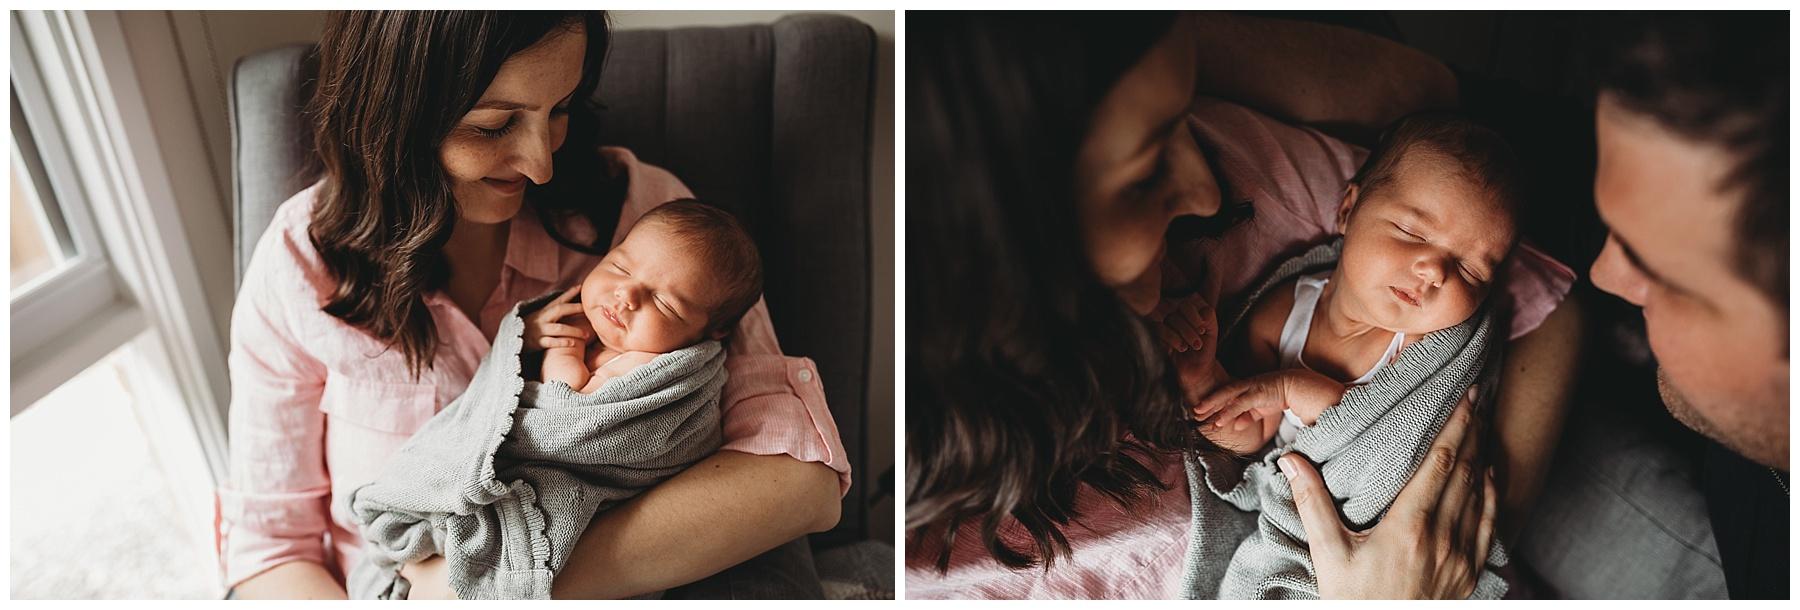 south gippsland newborn photographer - korumburra